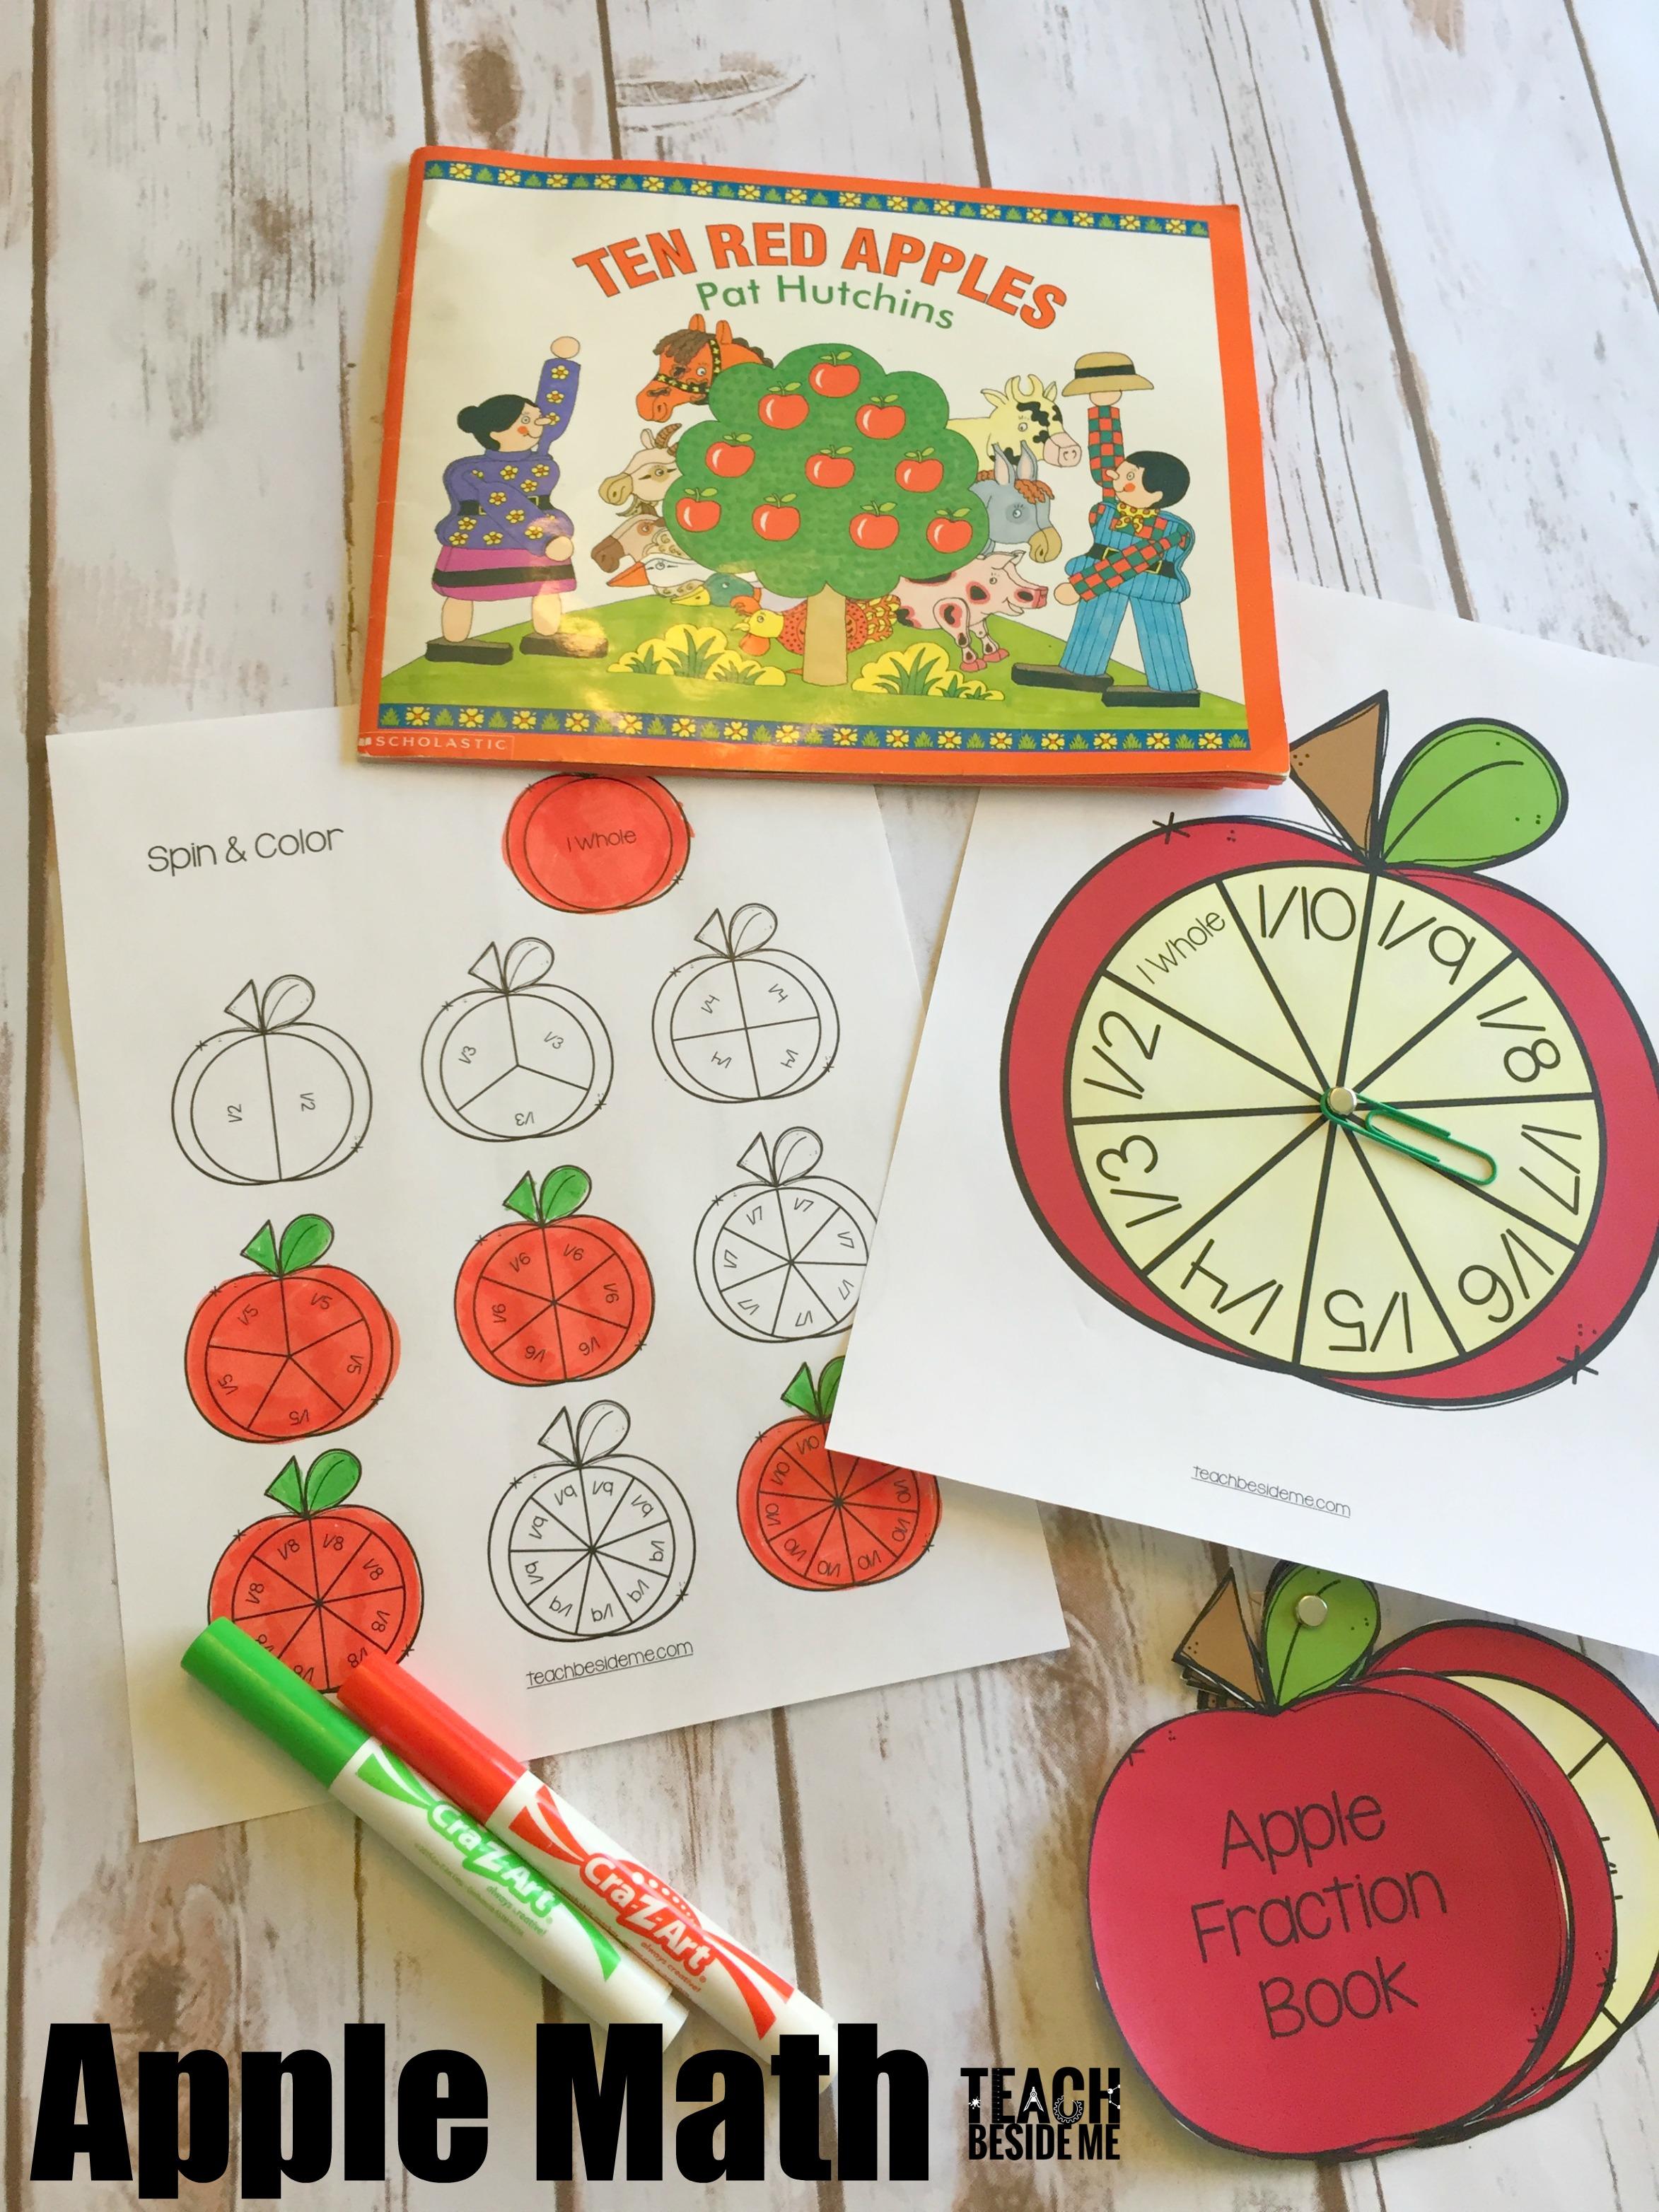 teach beside me creative homeschool and education ideas for kids